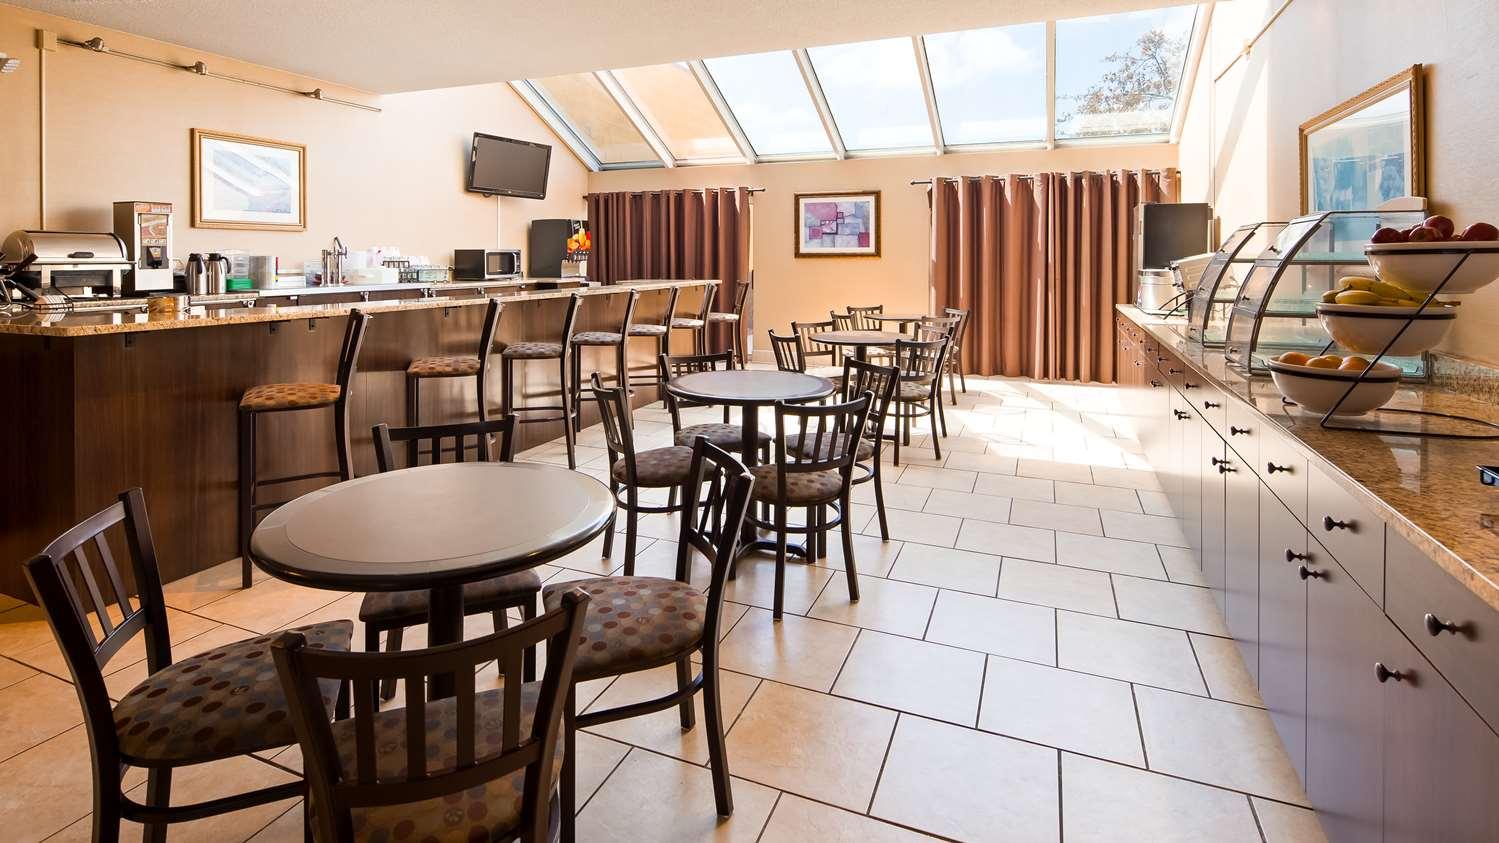 Restaurant - Best Western Resort Hotel Conference Ctr Portage